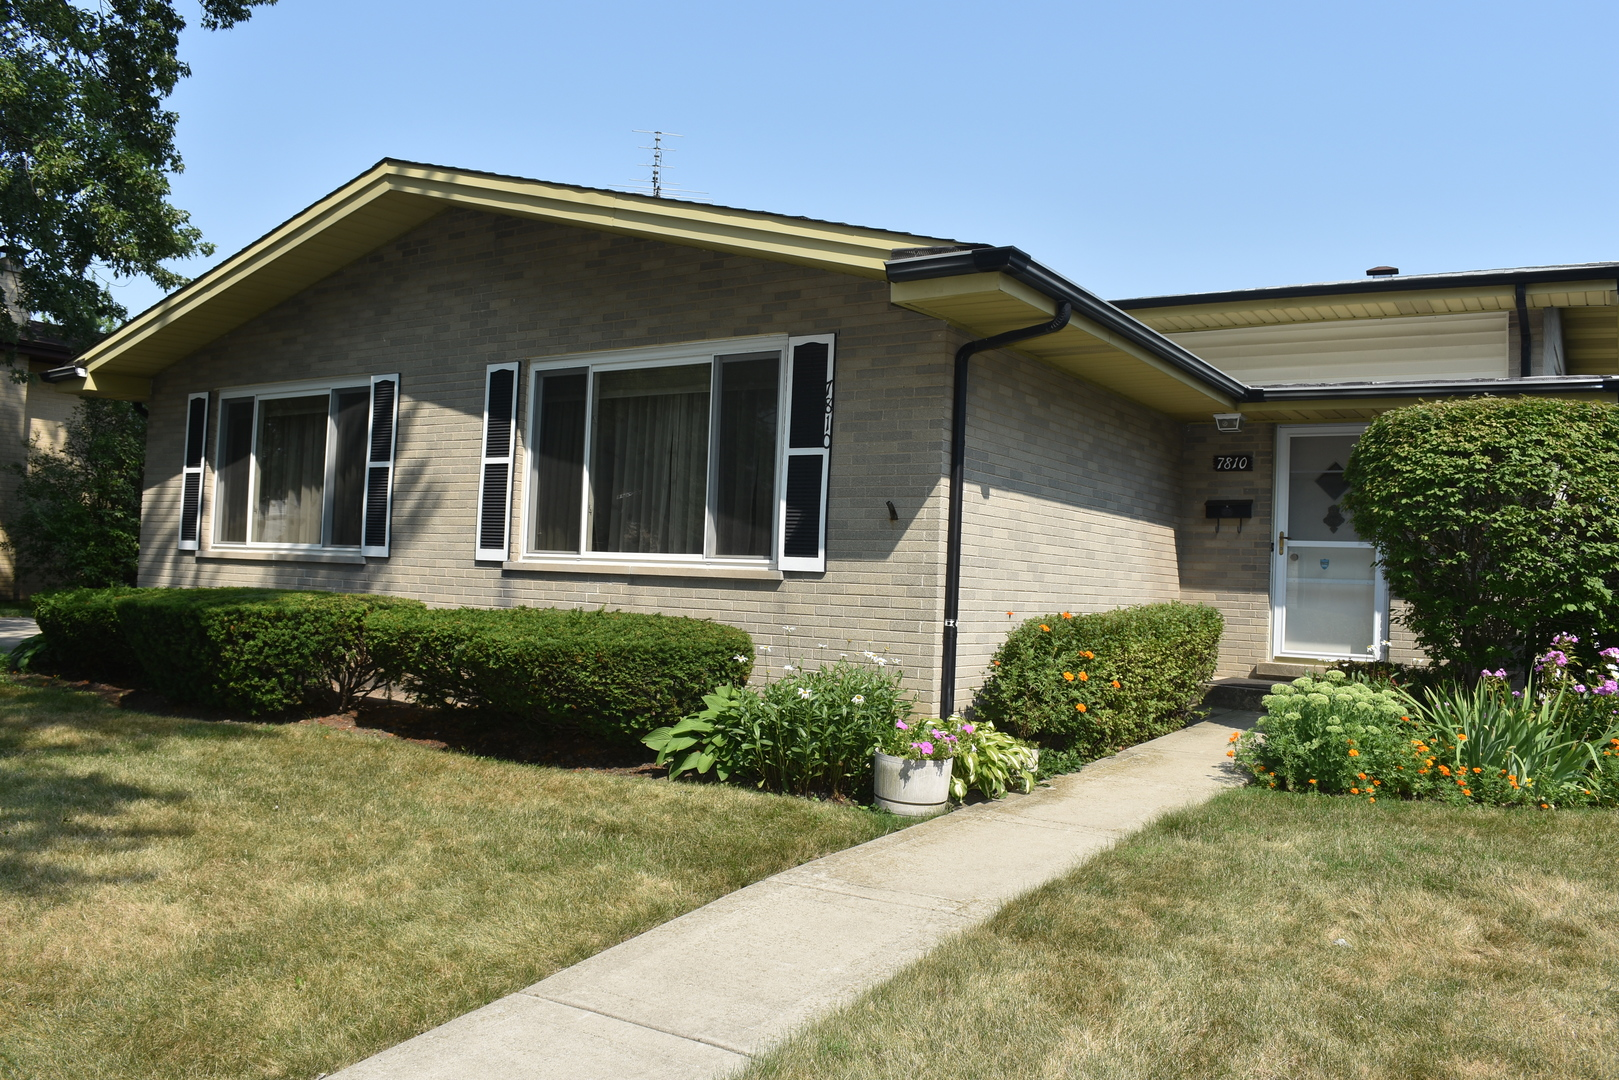 7810 Davis Street Morton Grove, IL 60053